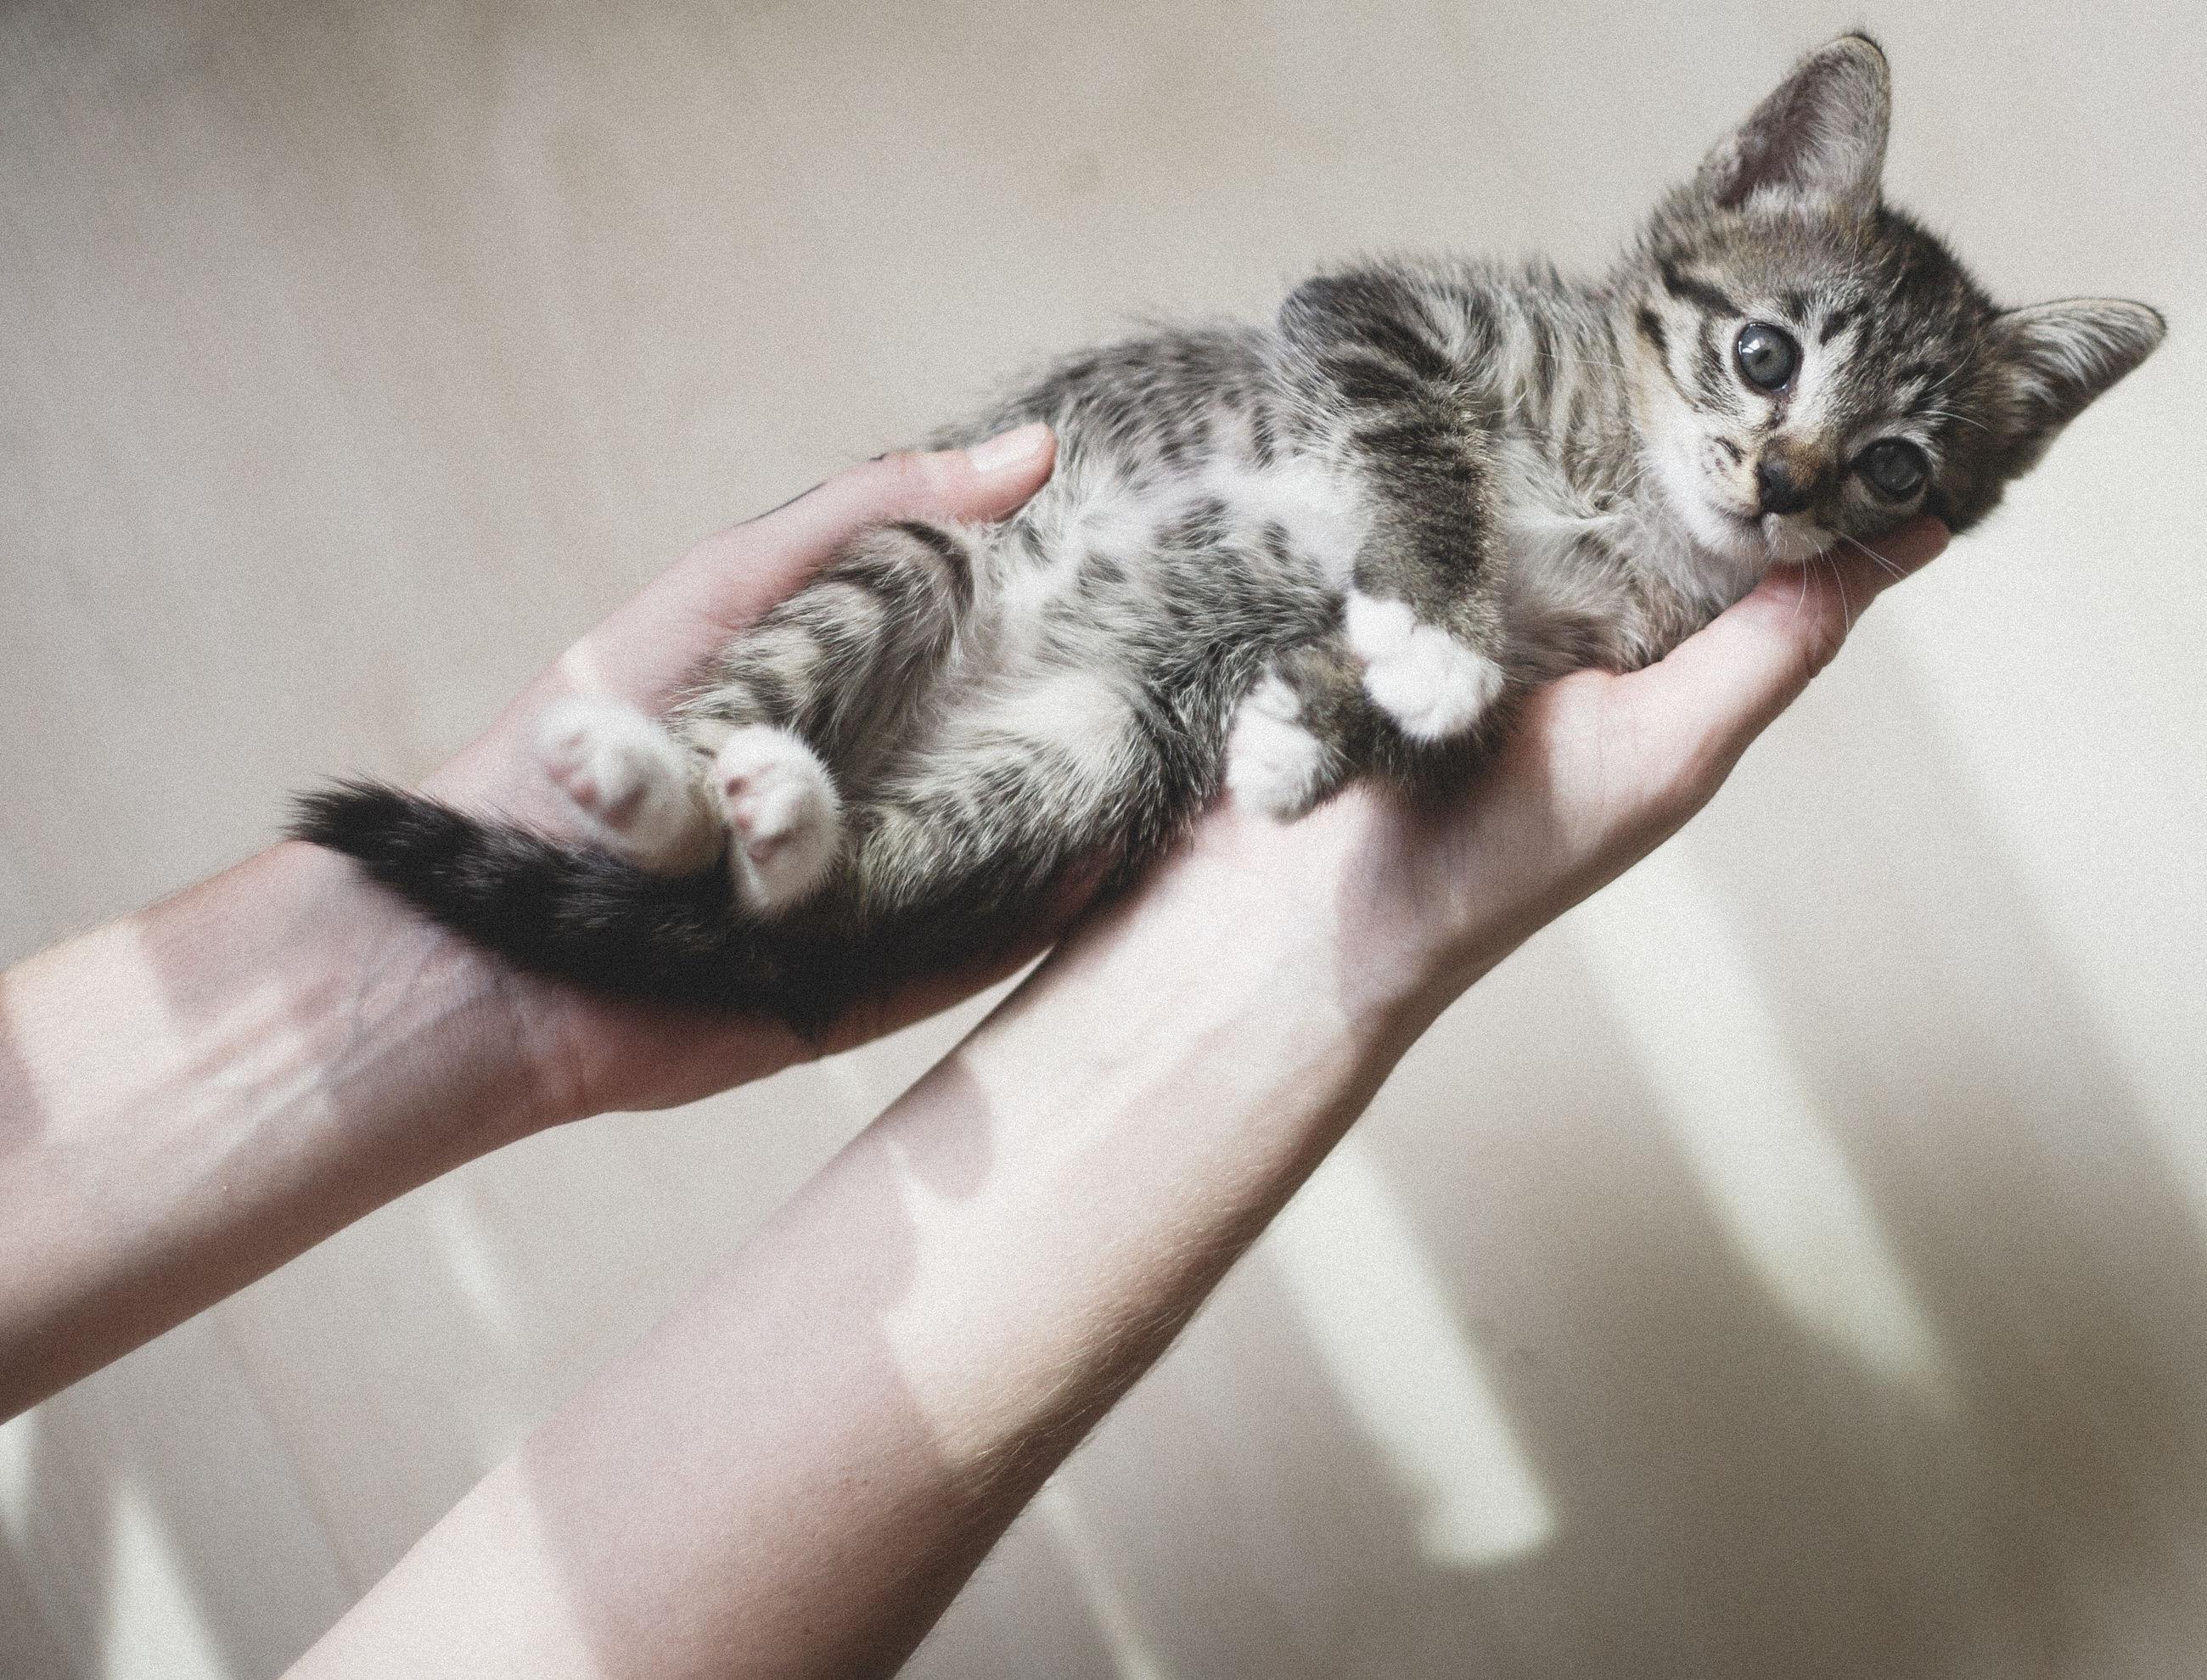 Close-up of hands holding a cute kitten